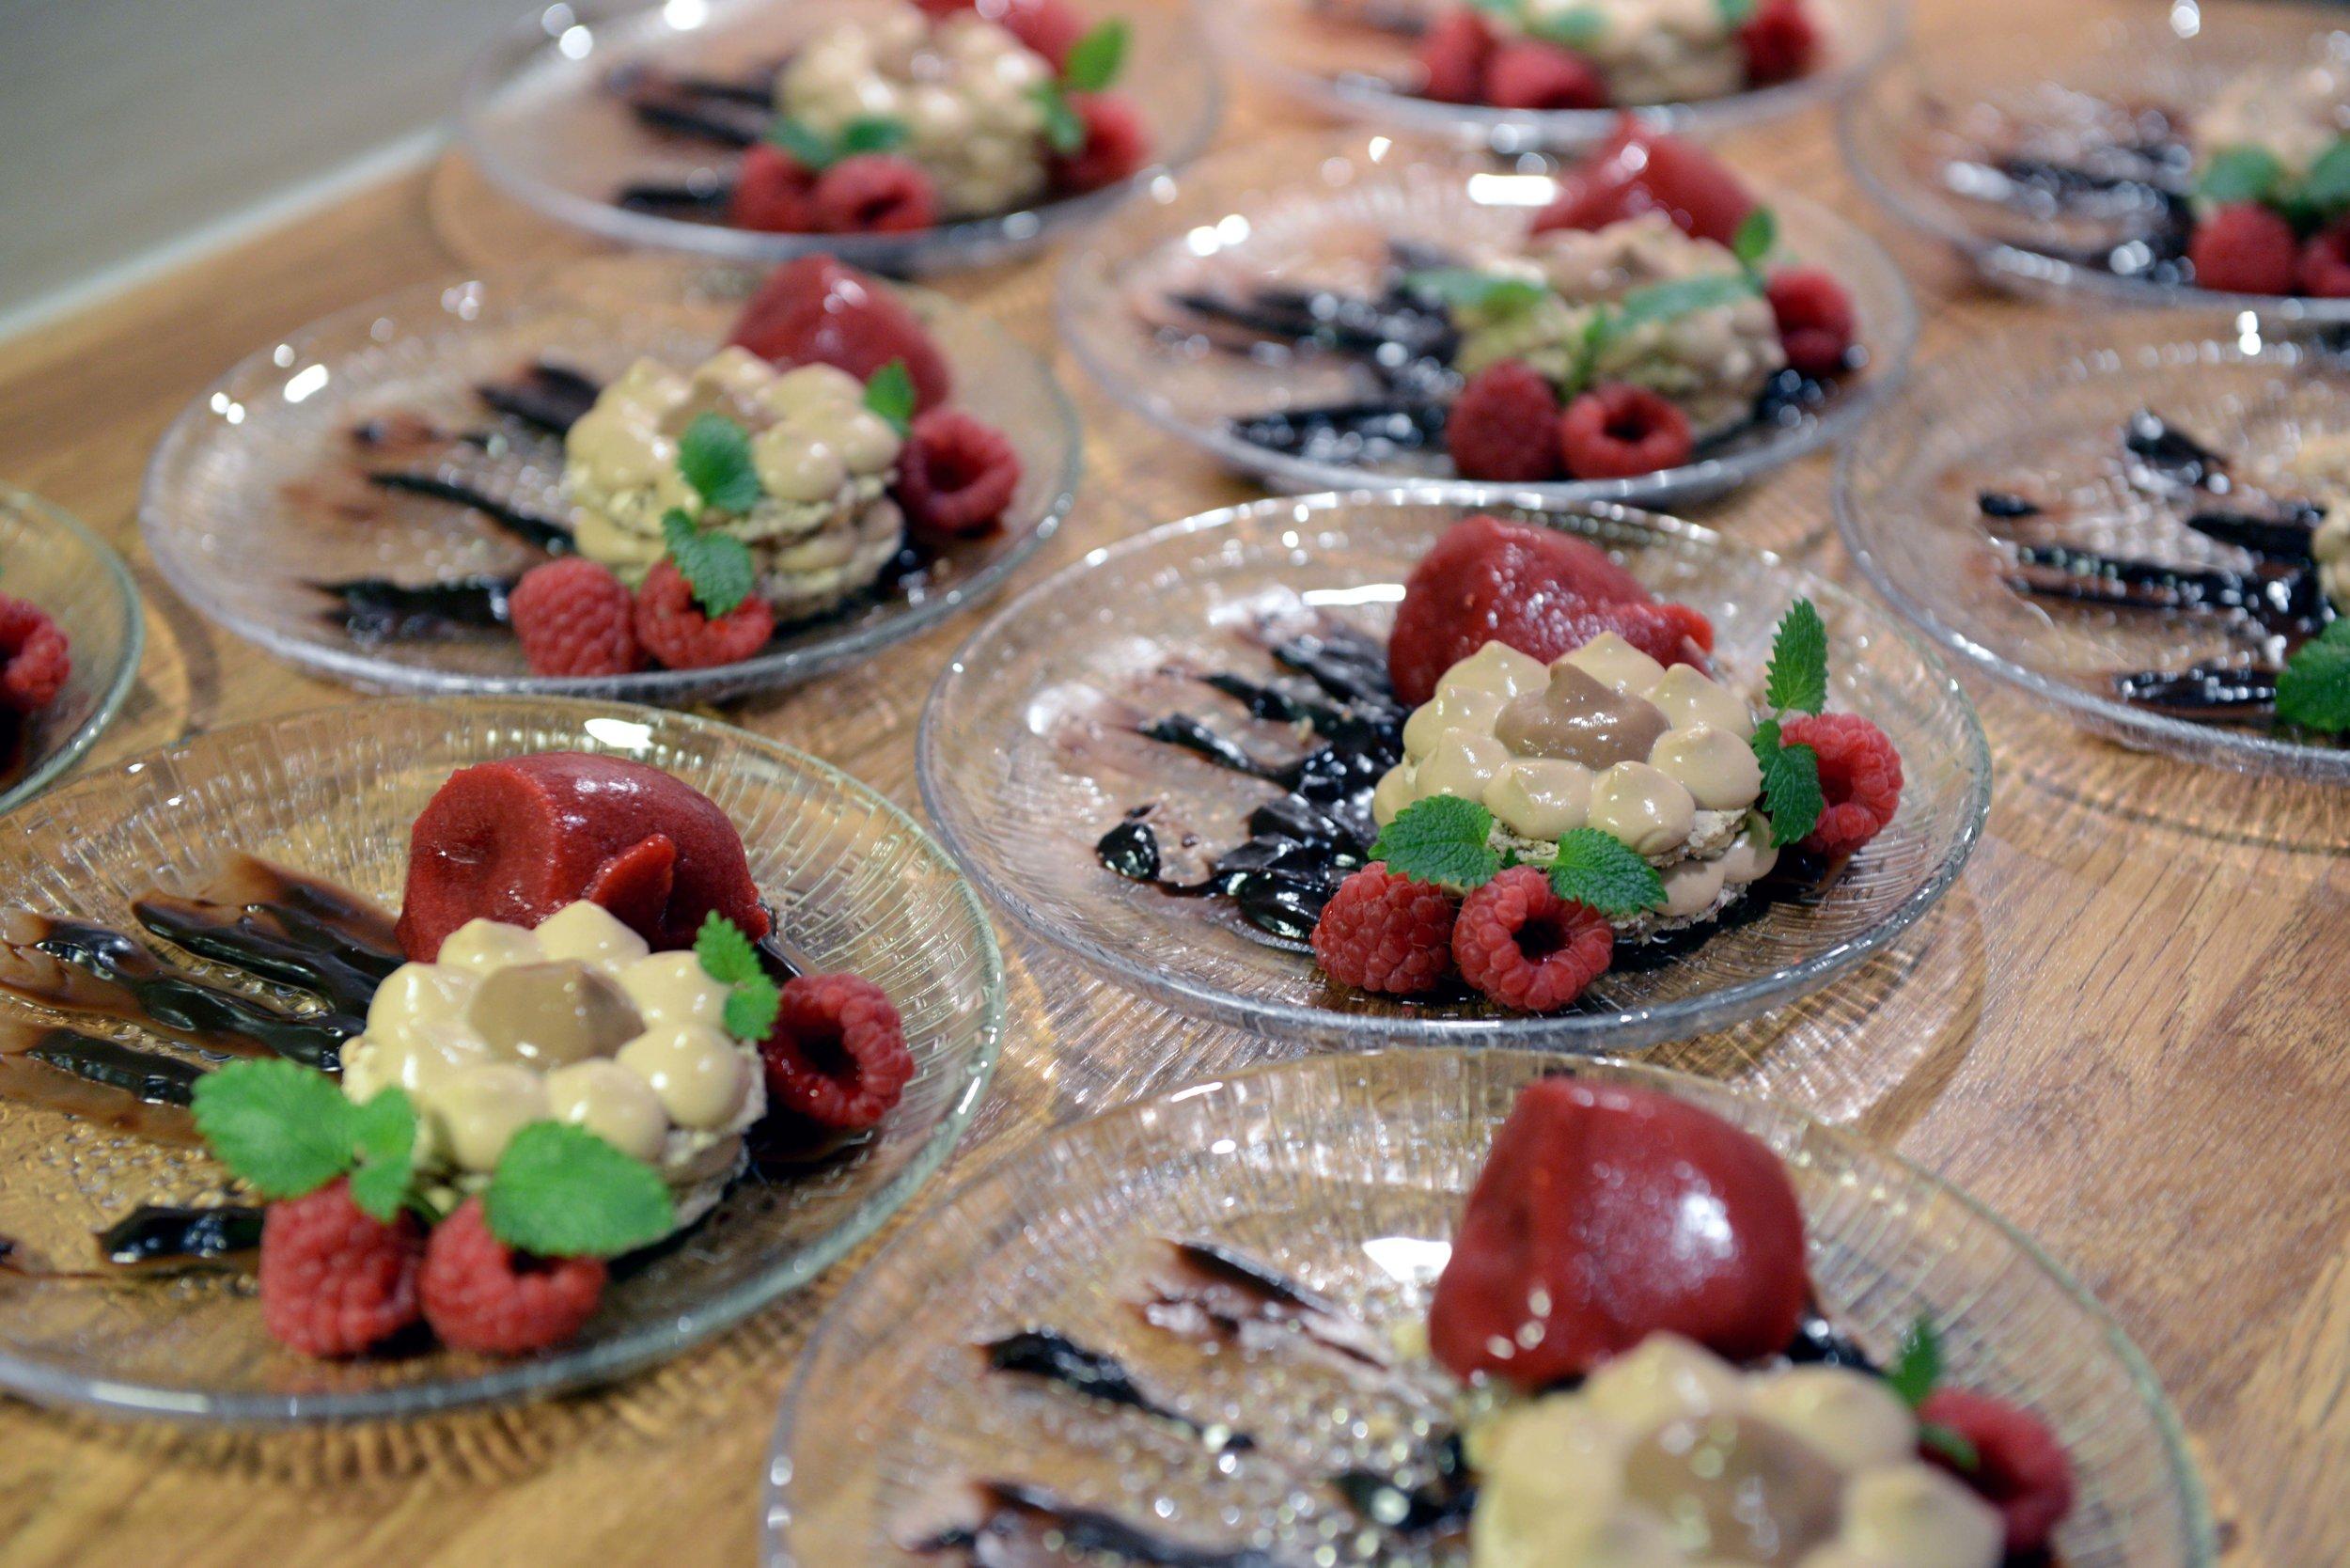 Desserten md bringerbær og sjokolade var ein vinnar! Delikat og velsmakande, akkurat slik det skal vere, seier Ragnhild. Foto: Arve Ullebø